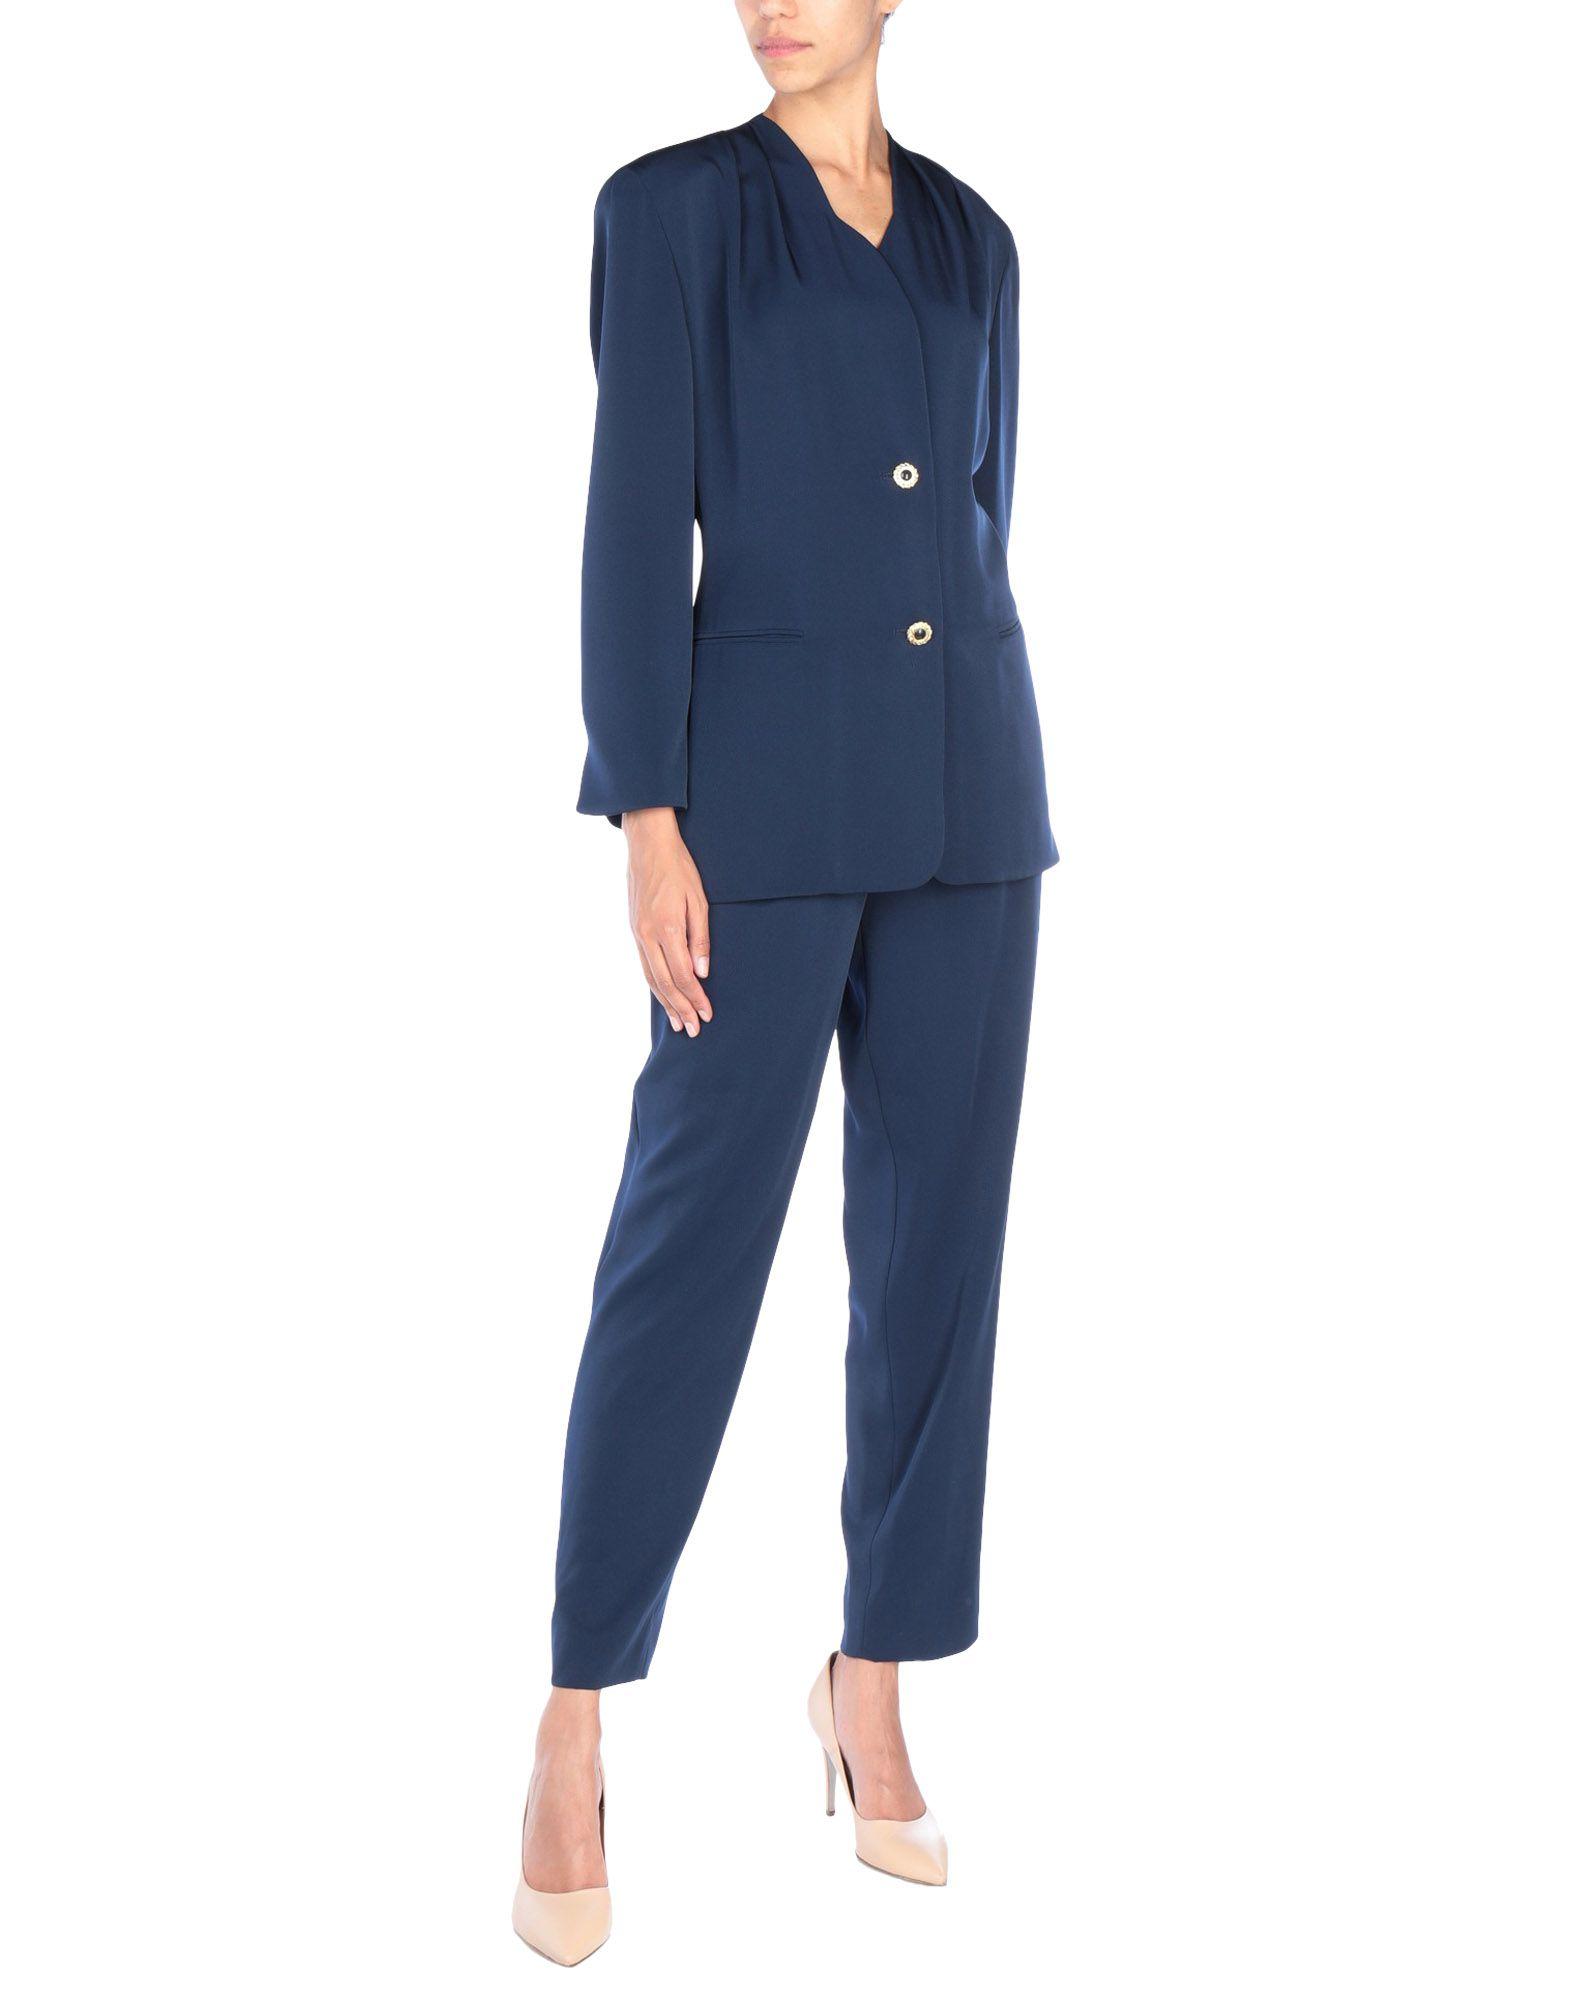 MODYVA | MODYVA Women's suits 49405173 | Goxip